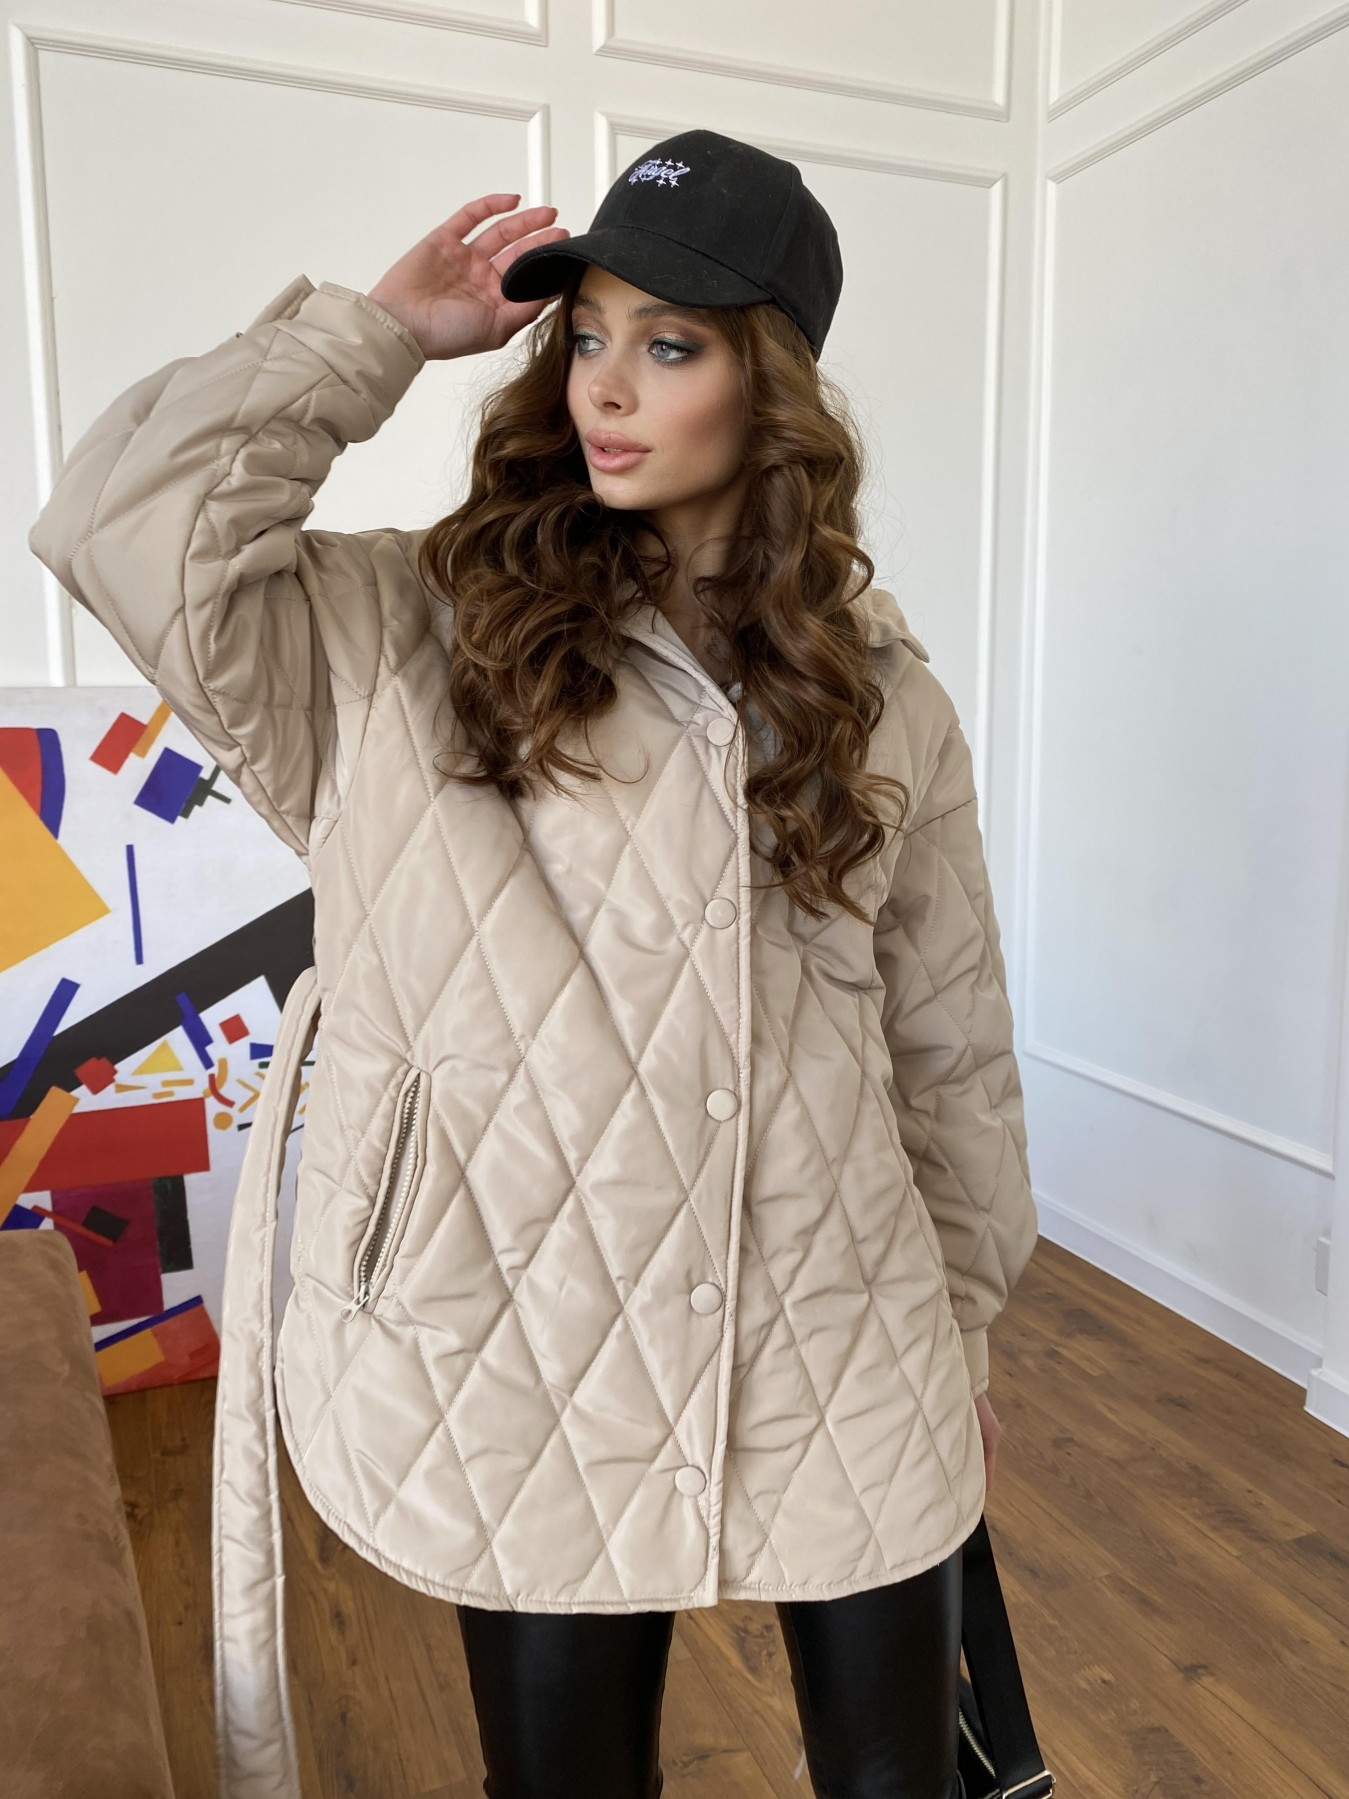 Пазл стеганая куртка из плащевки 10890 АРТ. 47449 Цвет: Бежевый - фото 6, интернет магазин tm-modus.ru